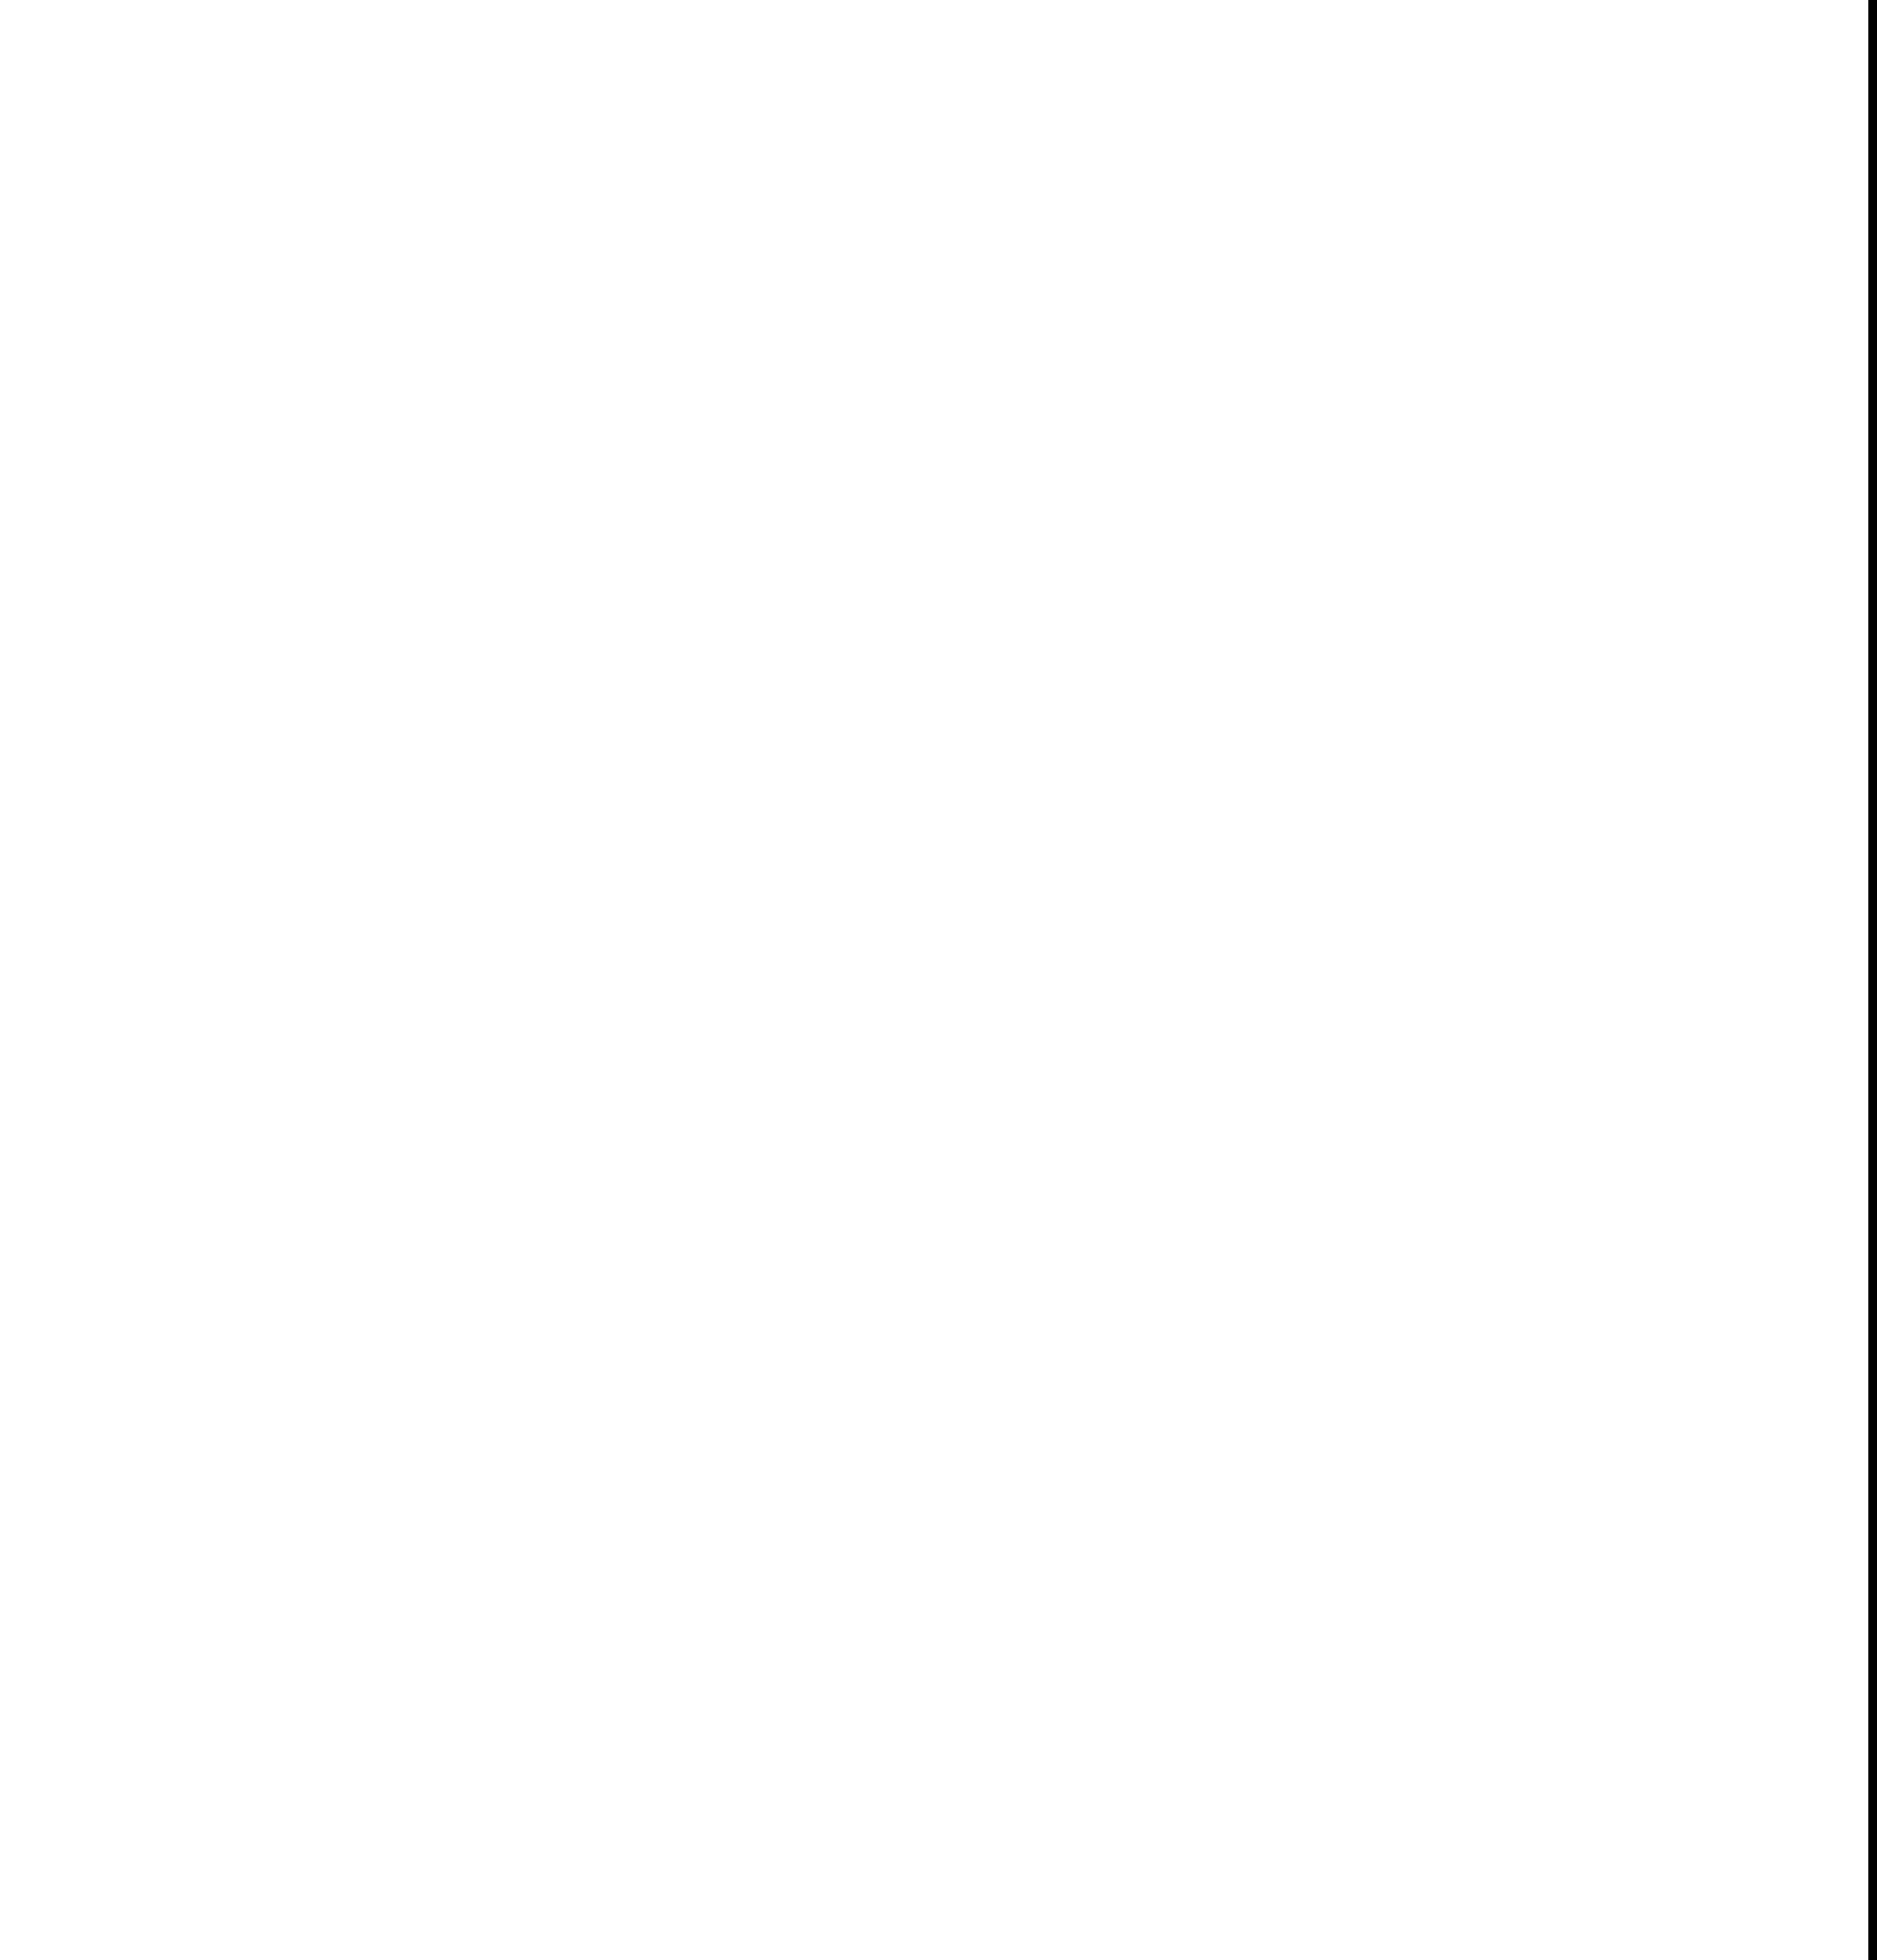 People Love Music